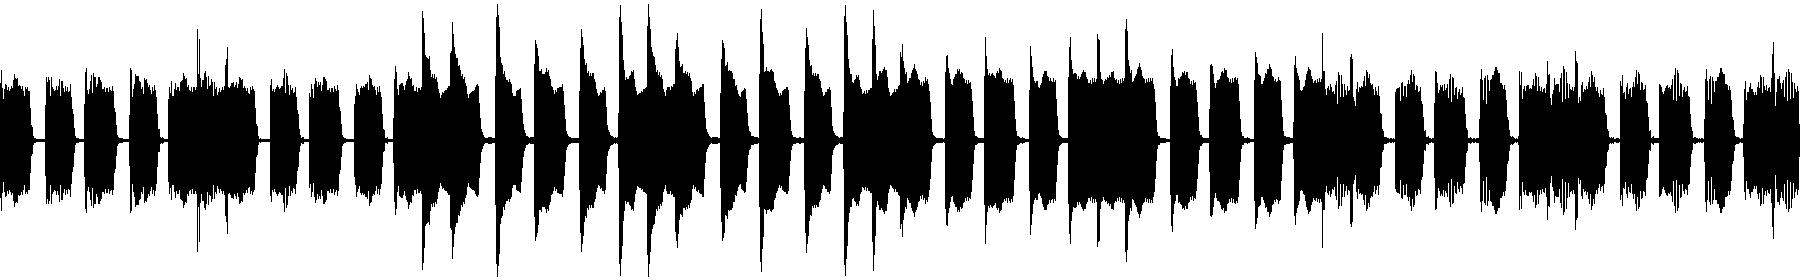 vedh melodyloop 085 fm7 9 cm7 9 gm7 9 dm7 9 120bpm